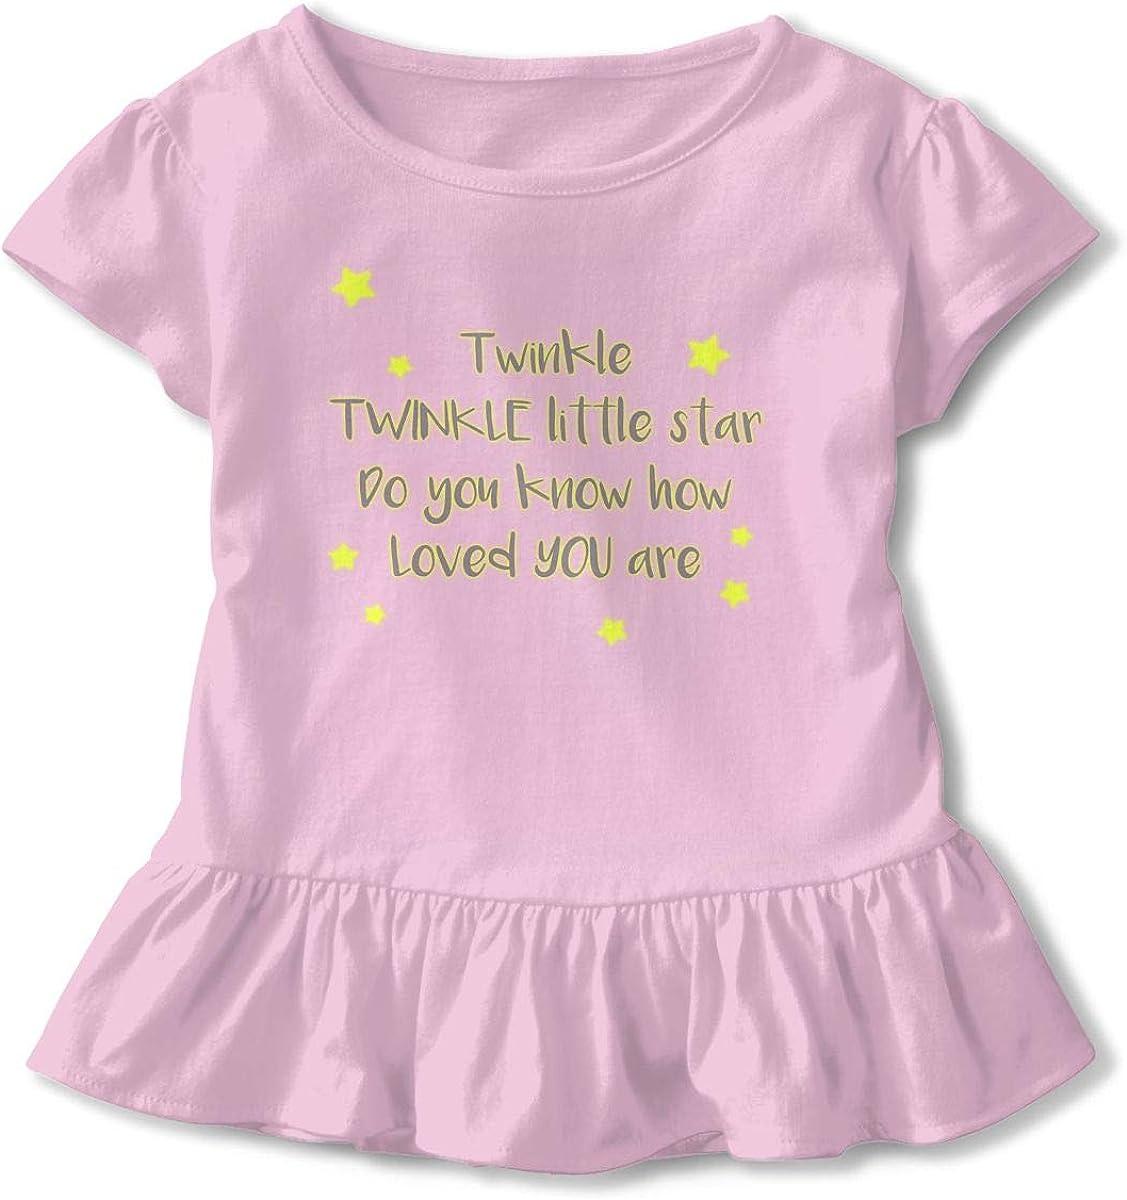 Sassy Like My Grandma Baby Skirts Cute Kids T Shirt Dress Short Sleeve Flounces Outfits